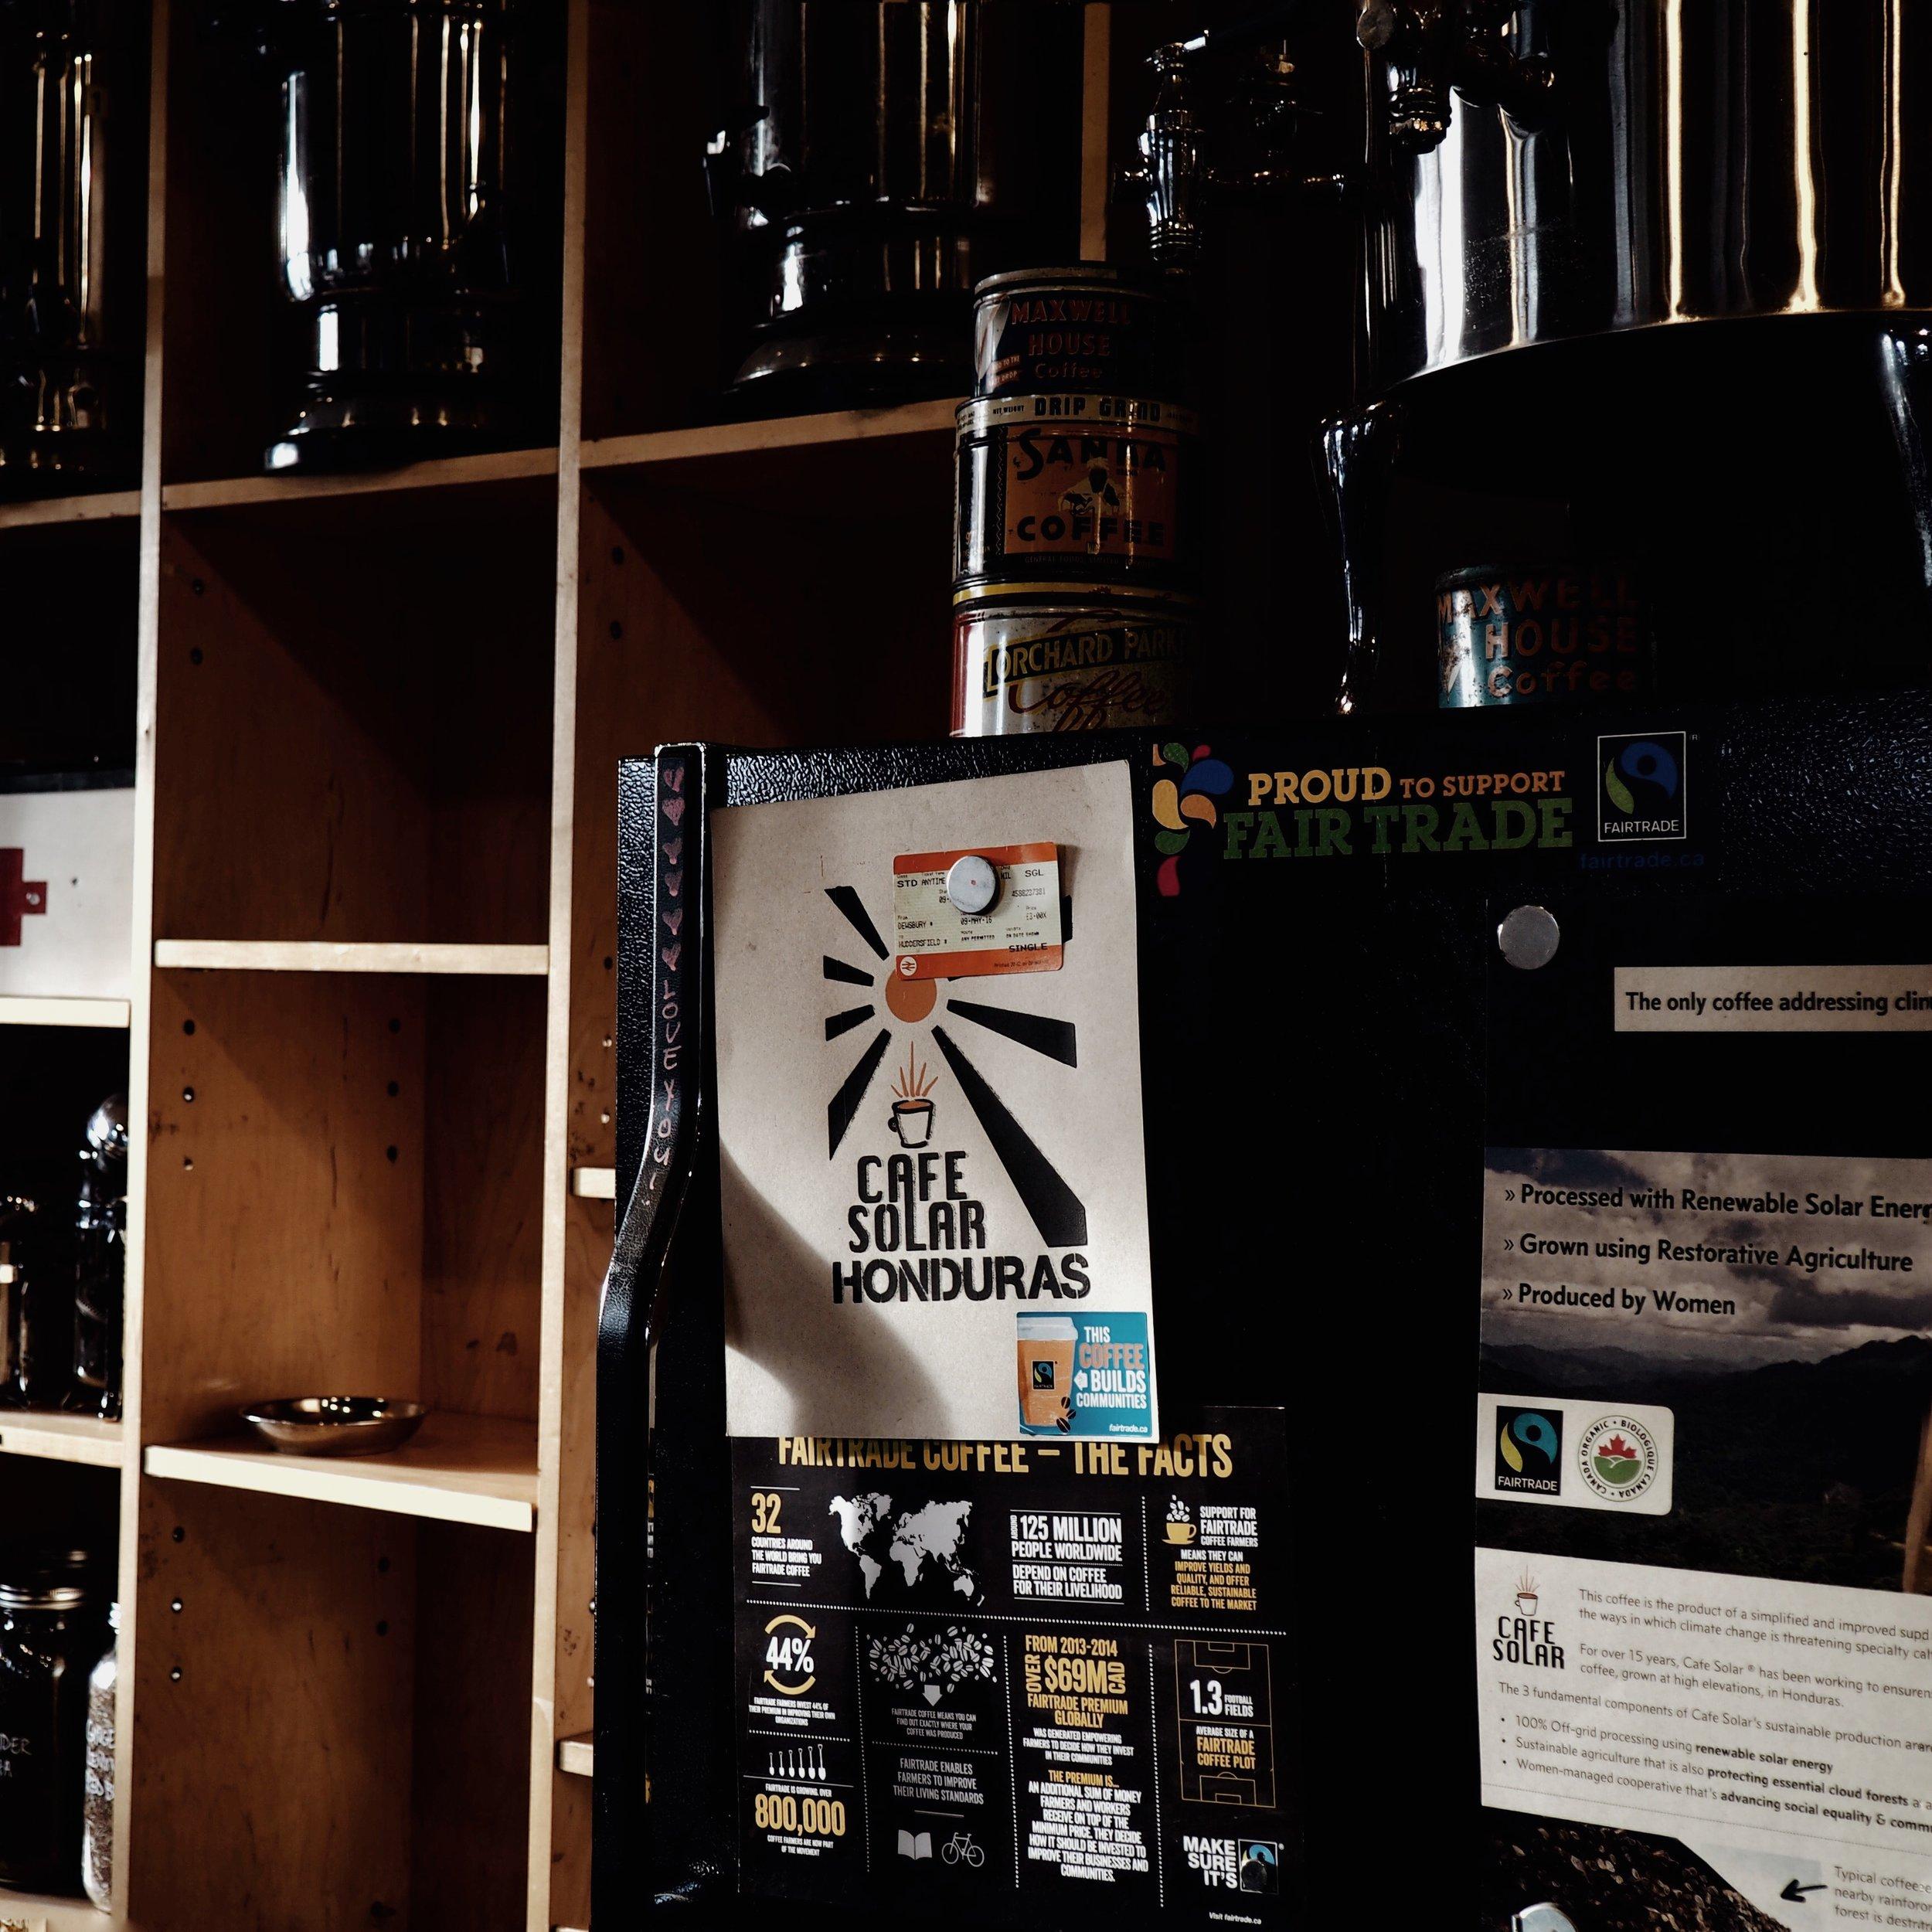 cafe solar honduras coffee